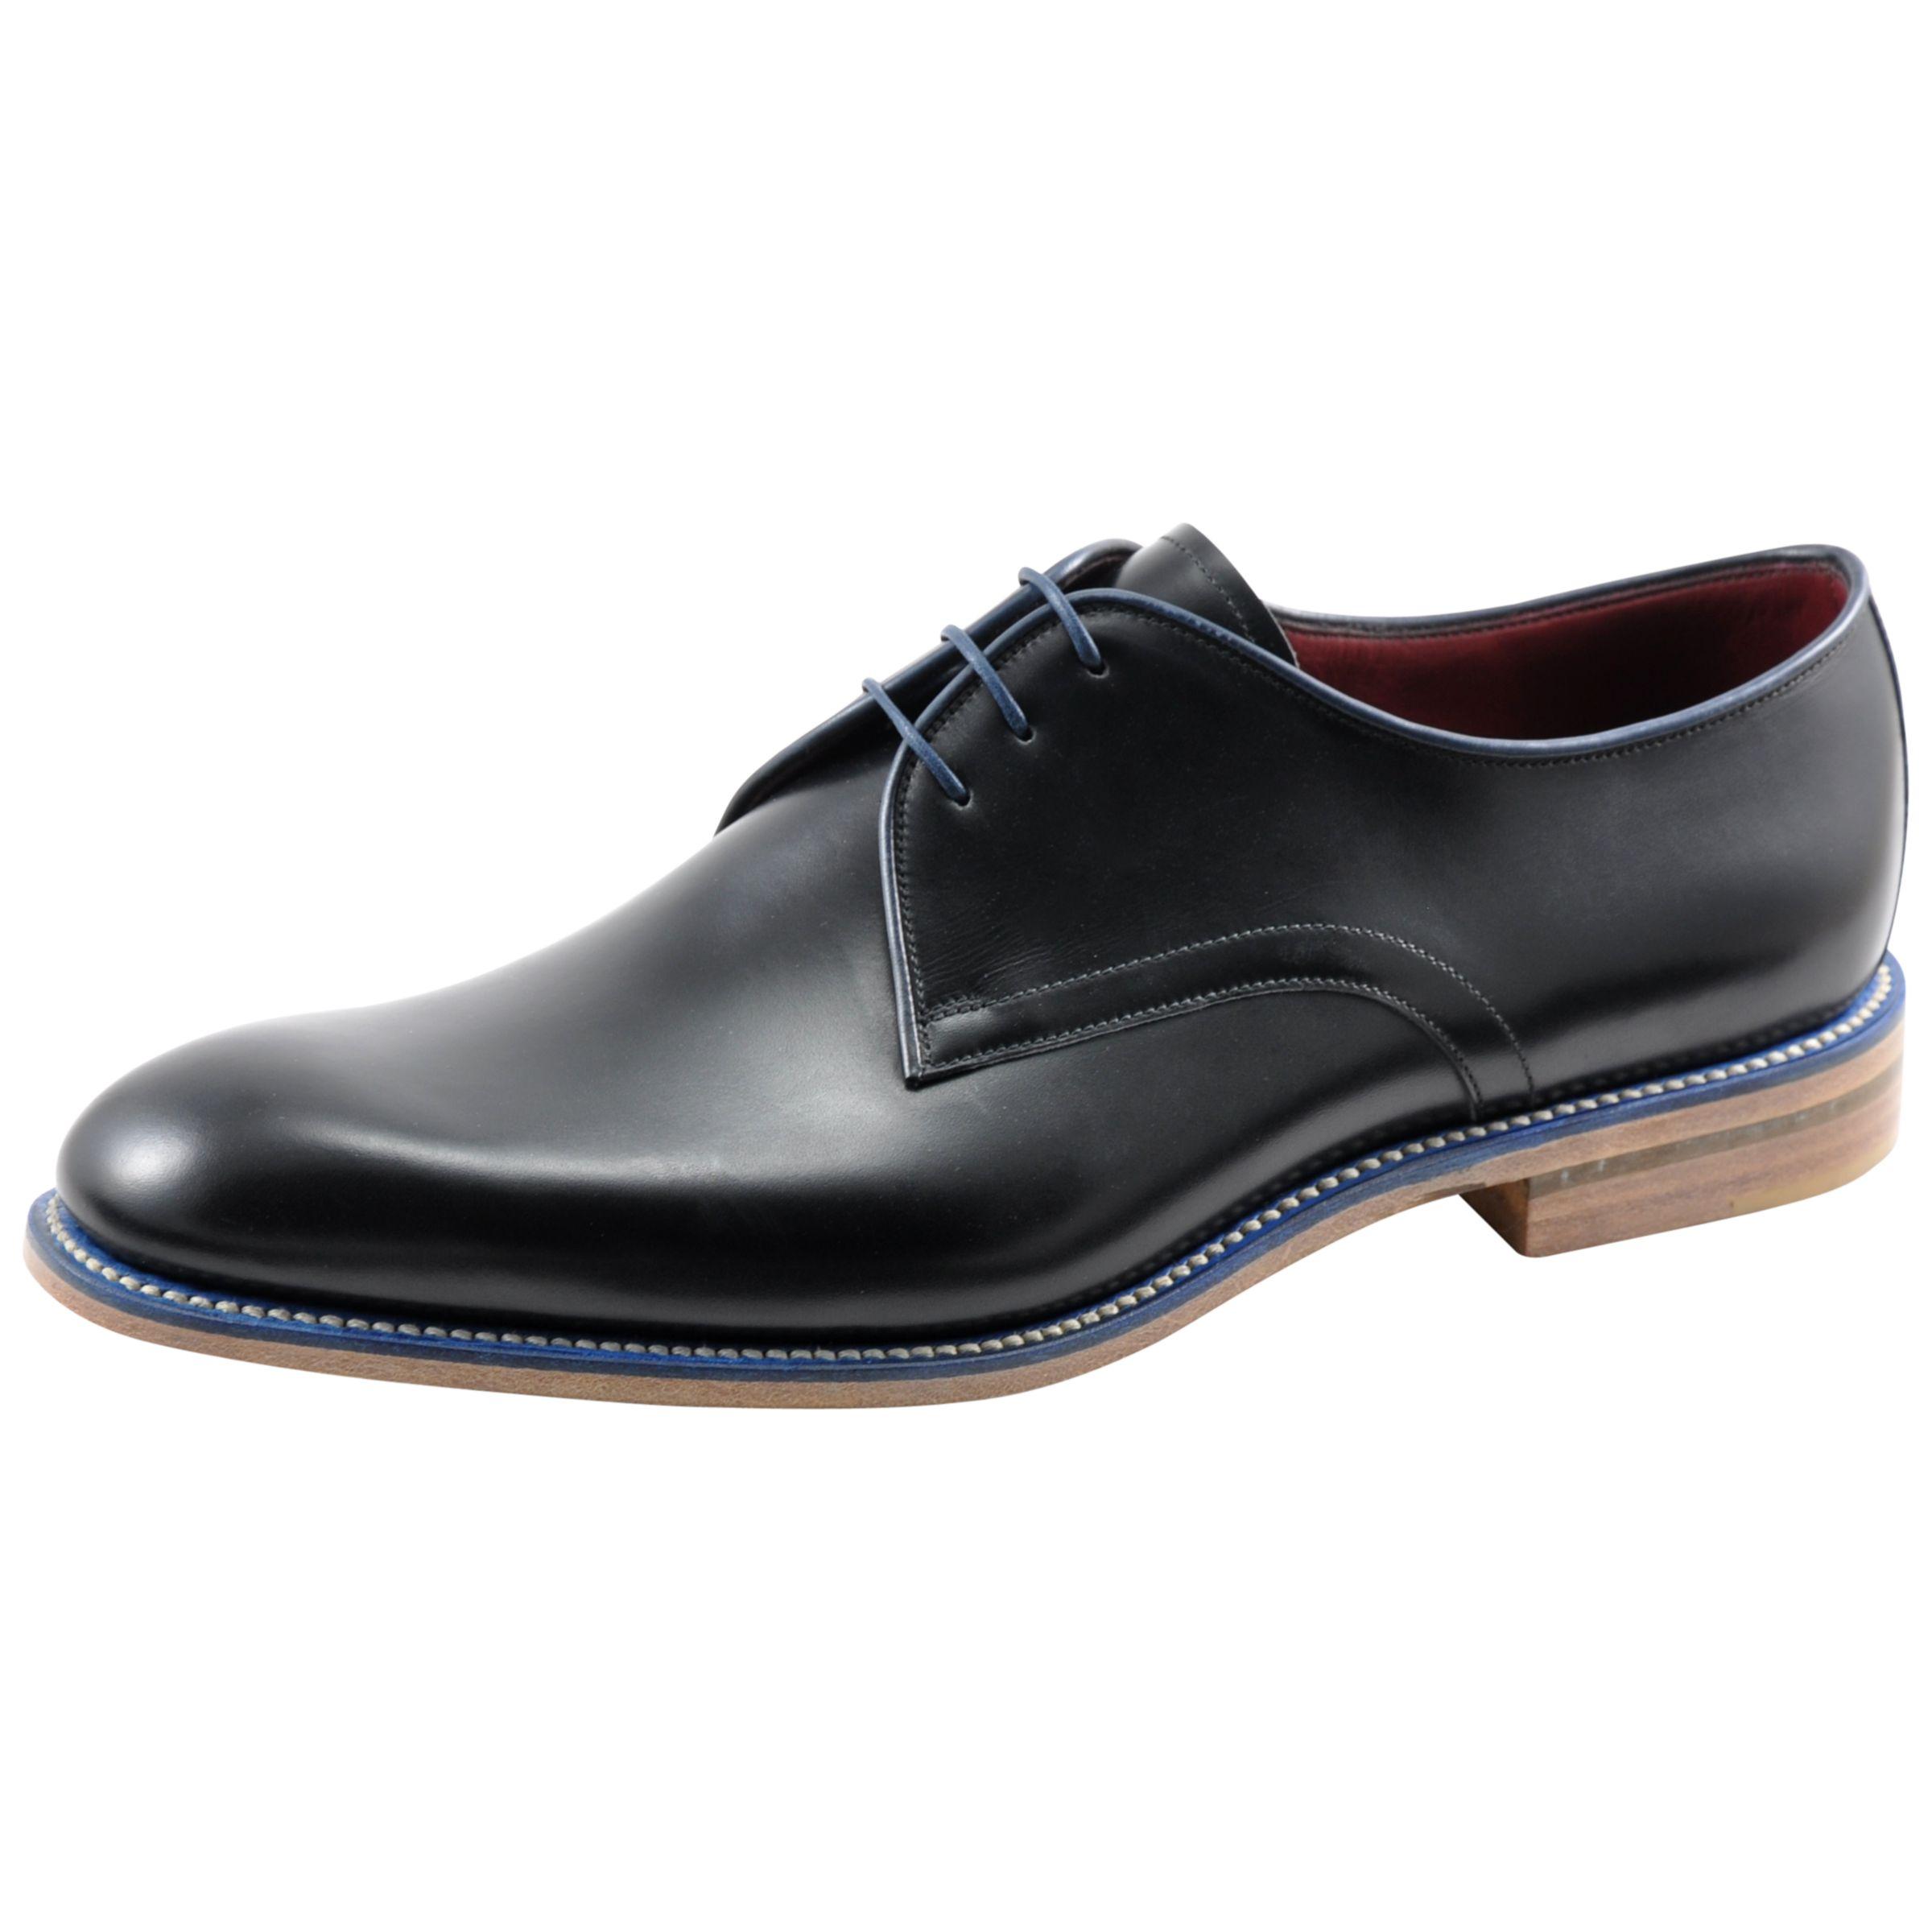 Loake Loake Drake Derby Shoes, Black